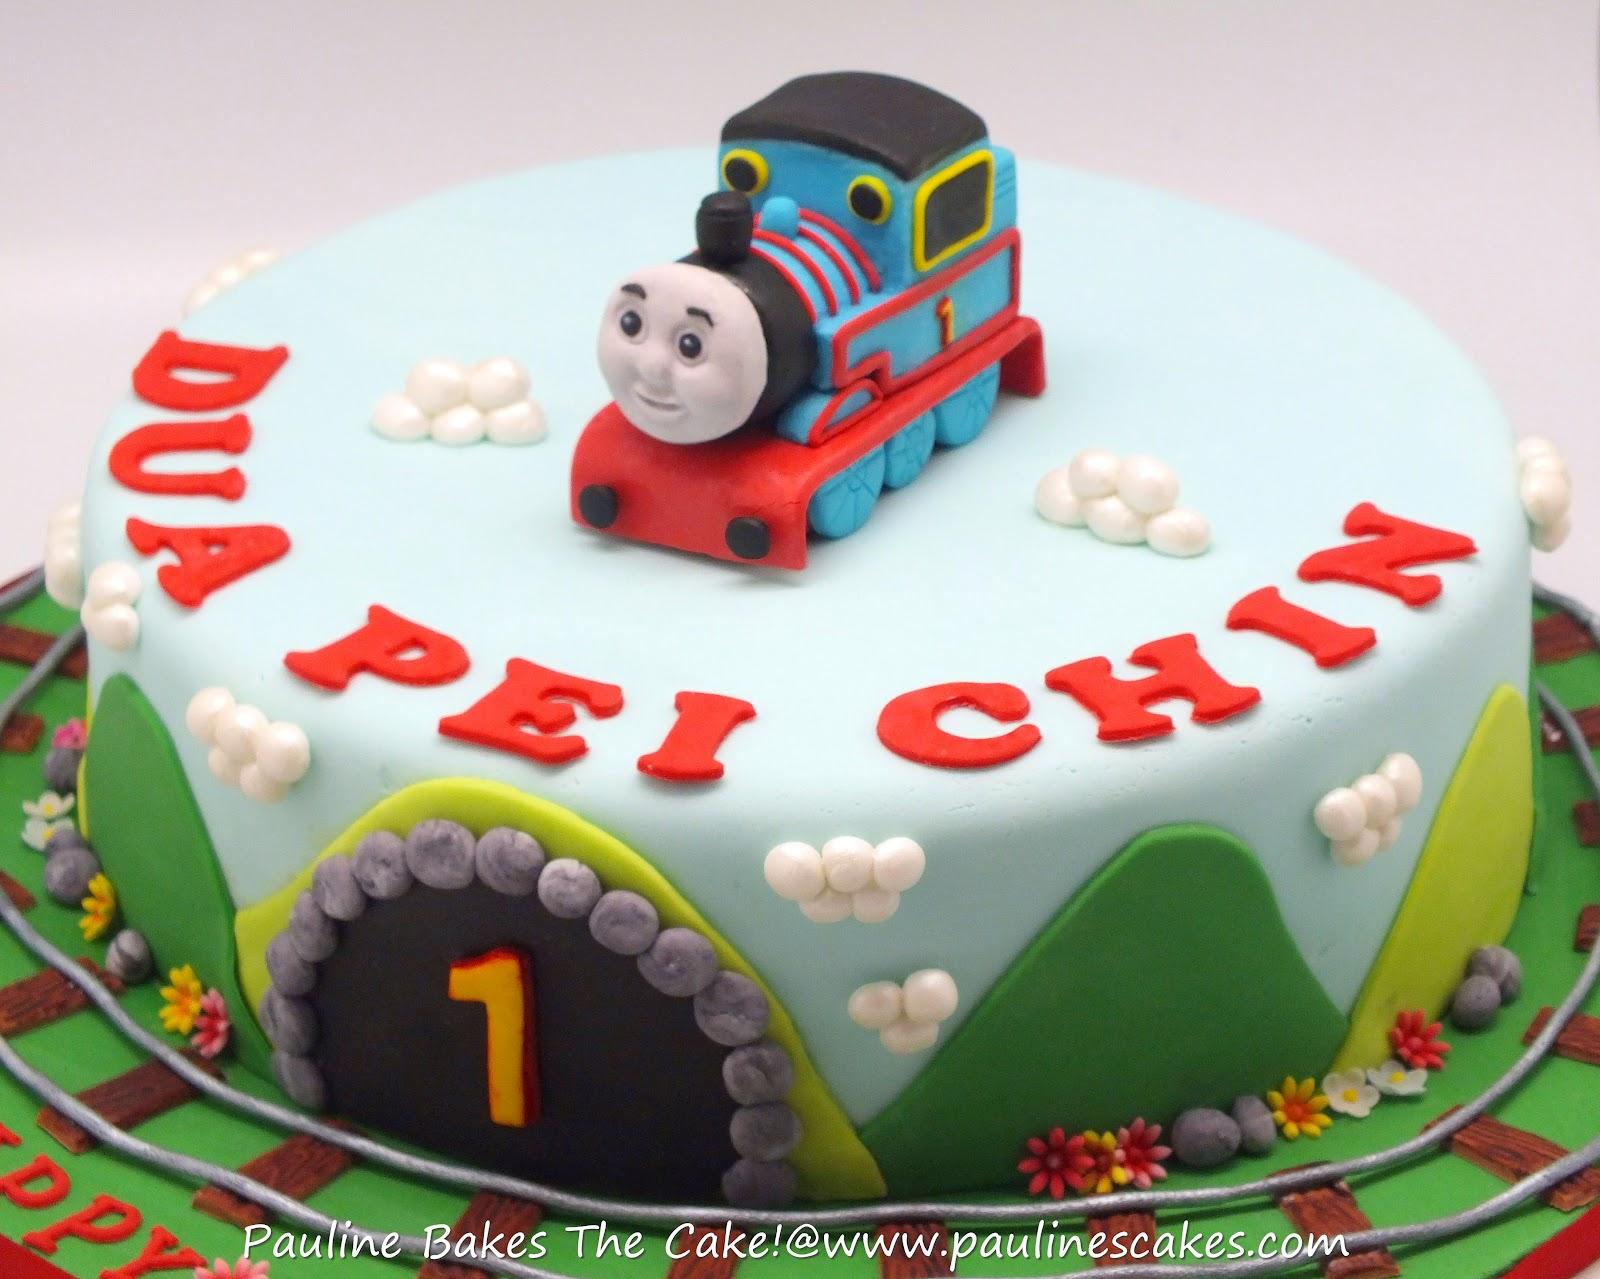 Pauline Bakes The Cake Pei Chins 1st Thomas The Engine